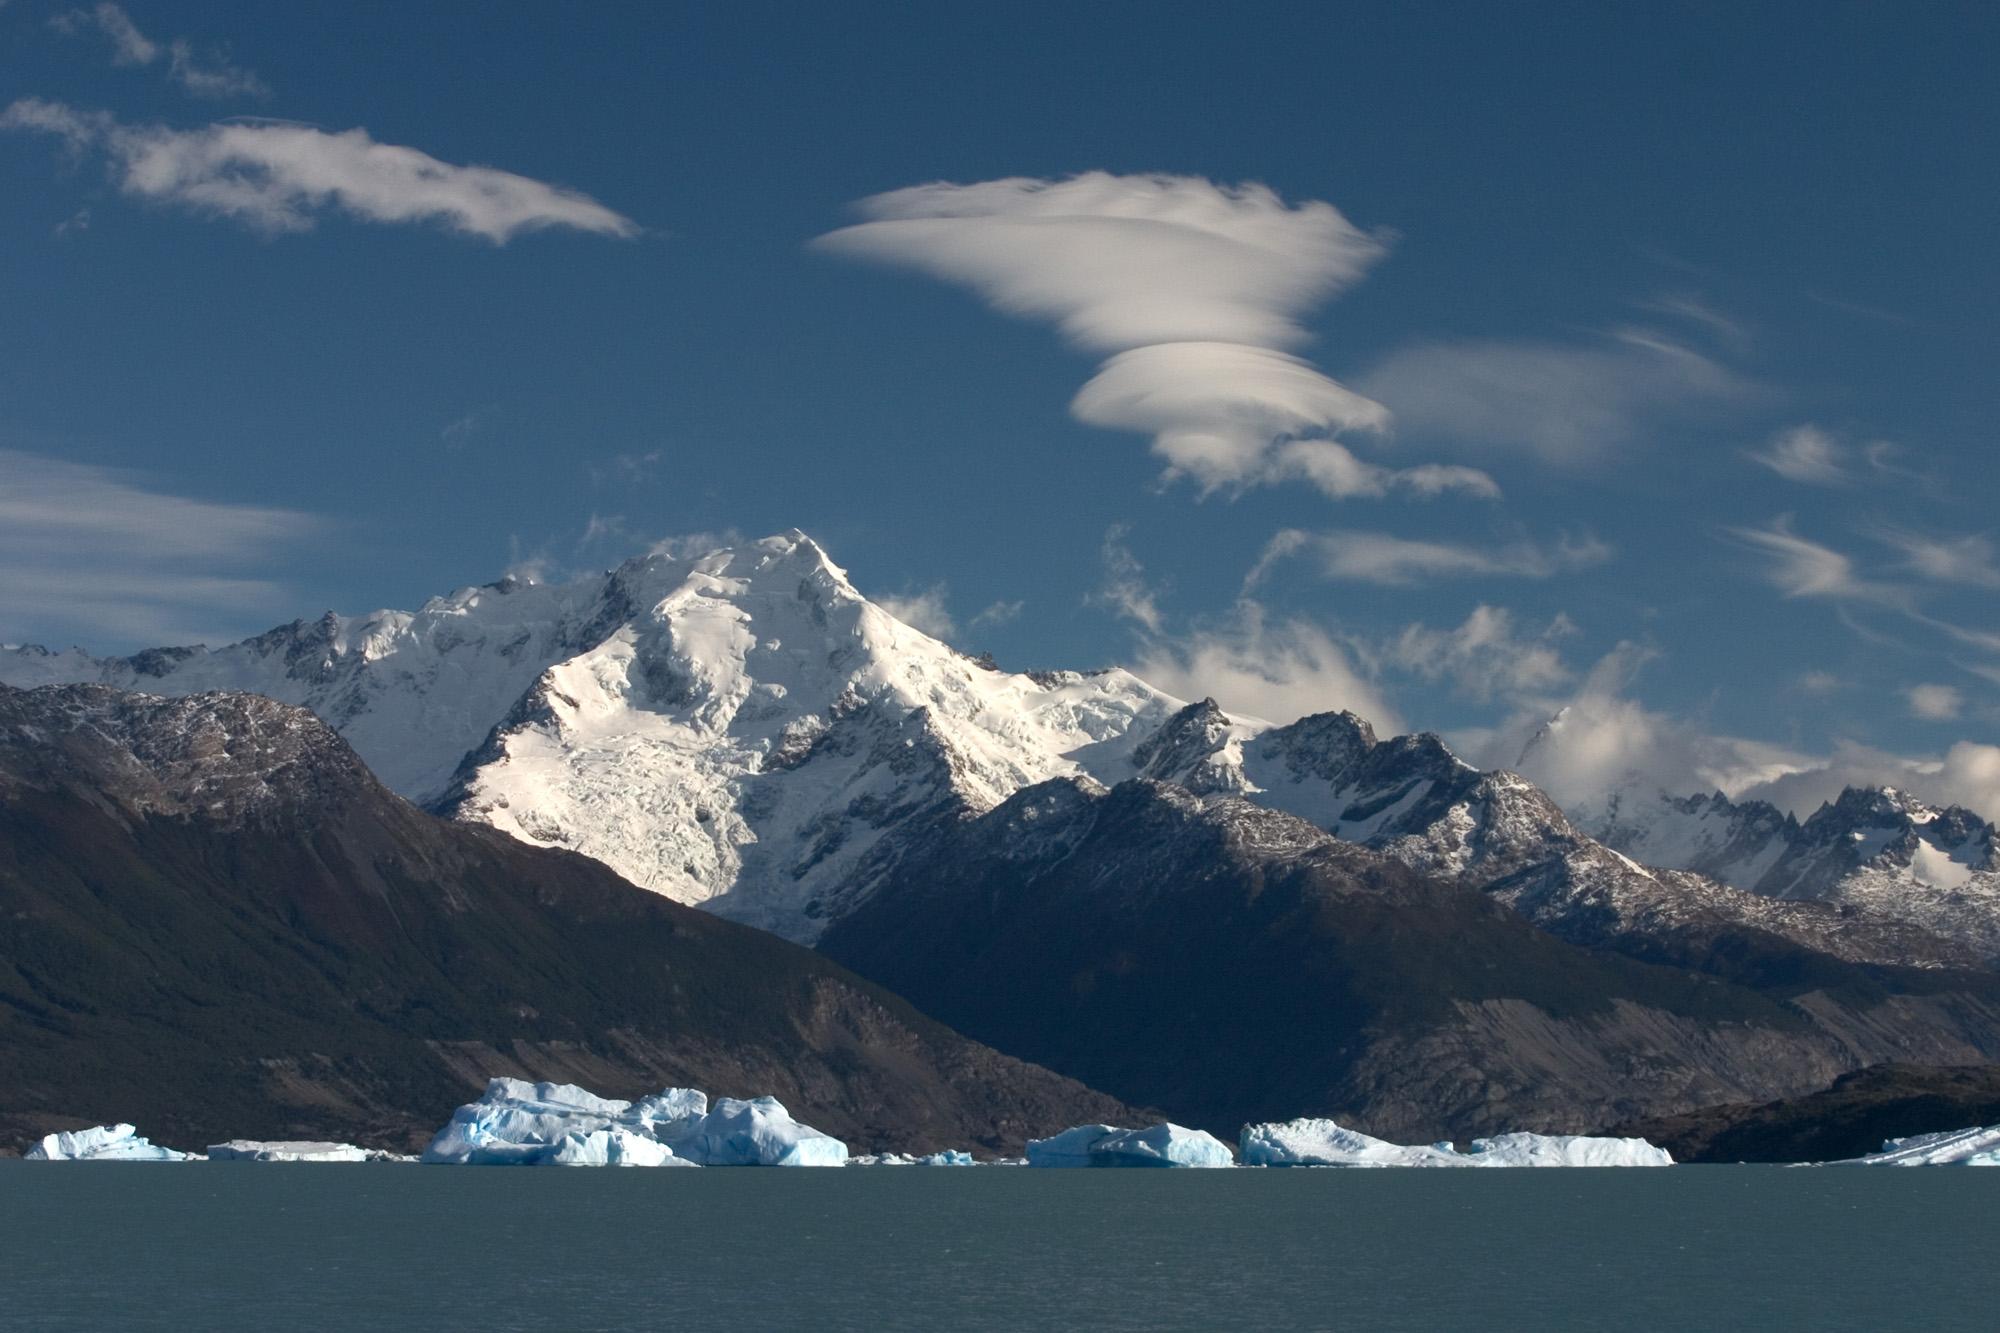 Argentina Lake_Argentino_northern_arm_Lago_Argentino_Brazo_Norte_Patagonia_Argentina_Luca_Galuzzi_2005